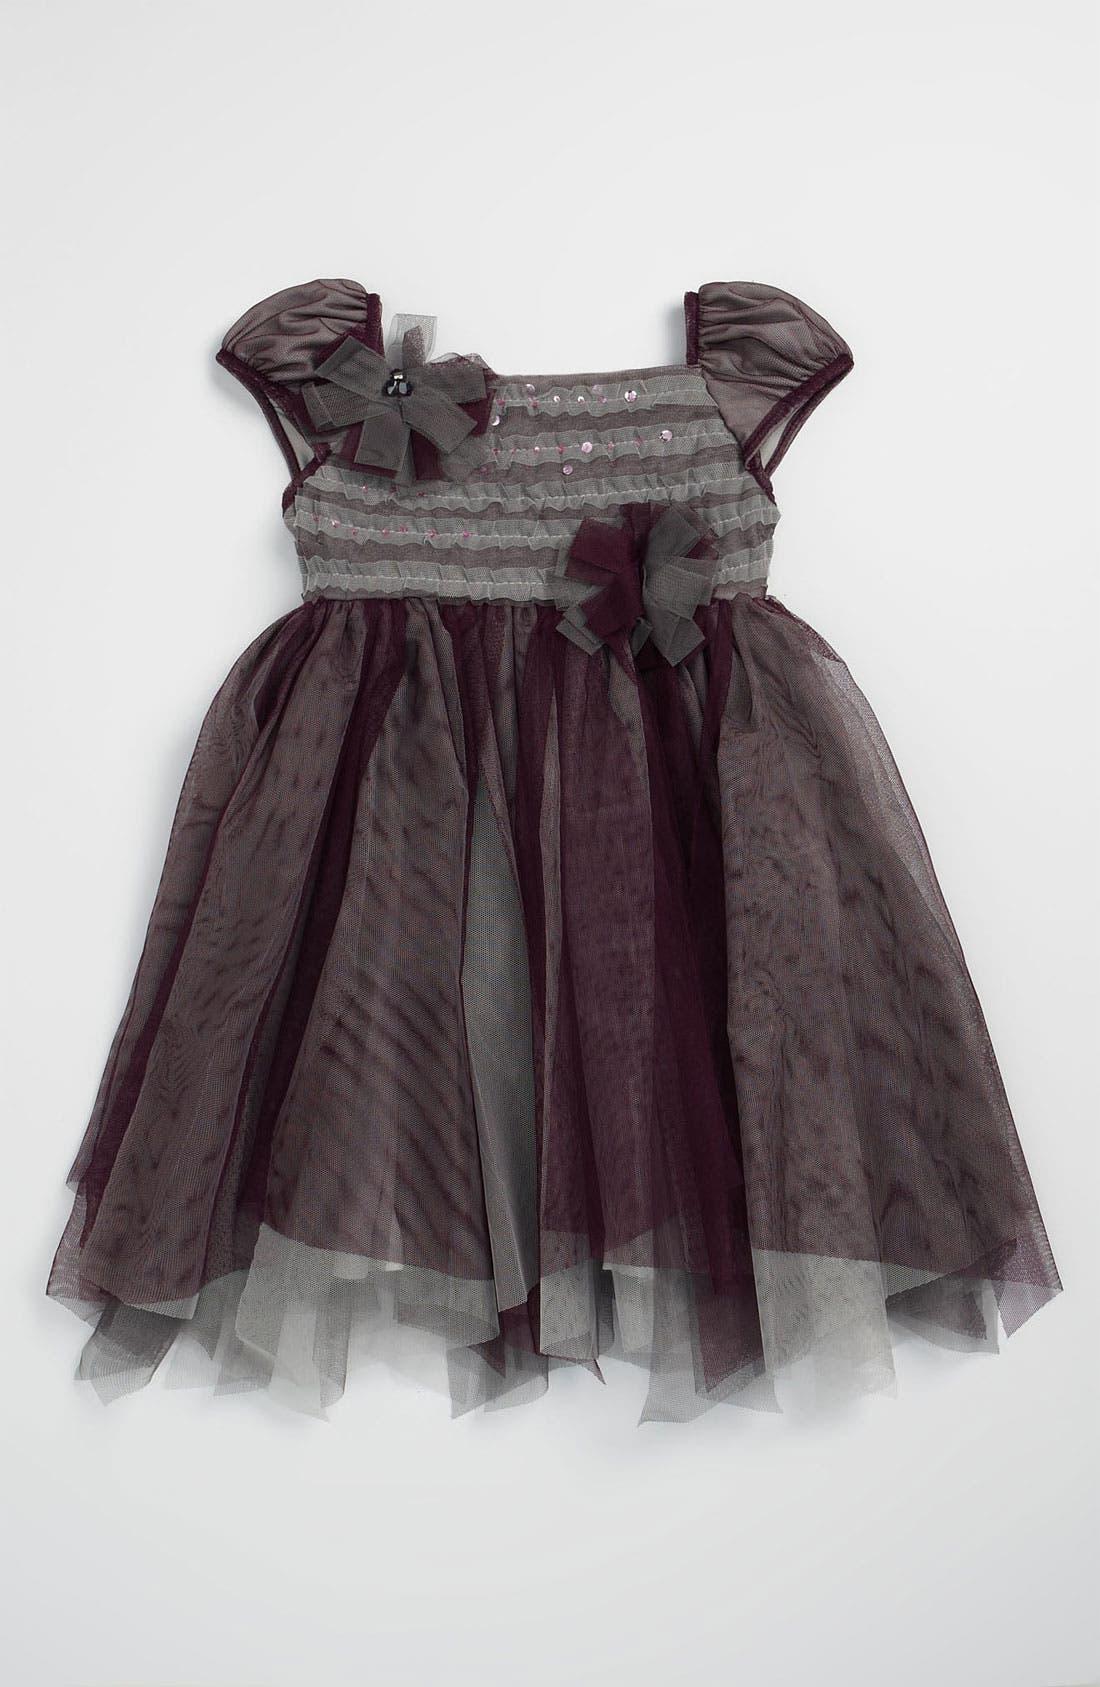 Main Image - Isobella & Chloe 'Plum Kisses' Dress (Toddler)